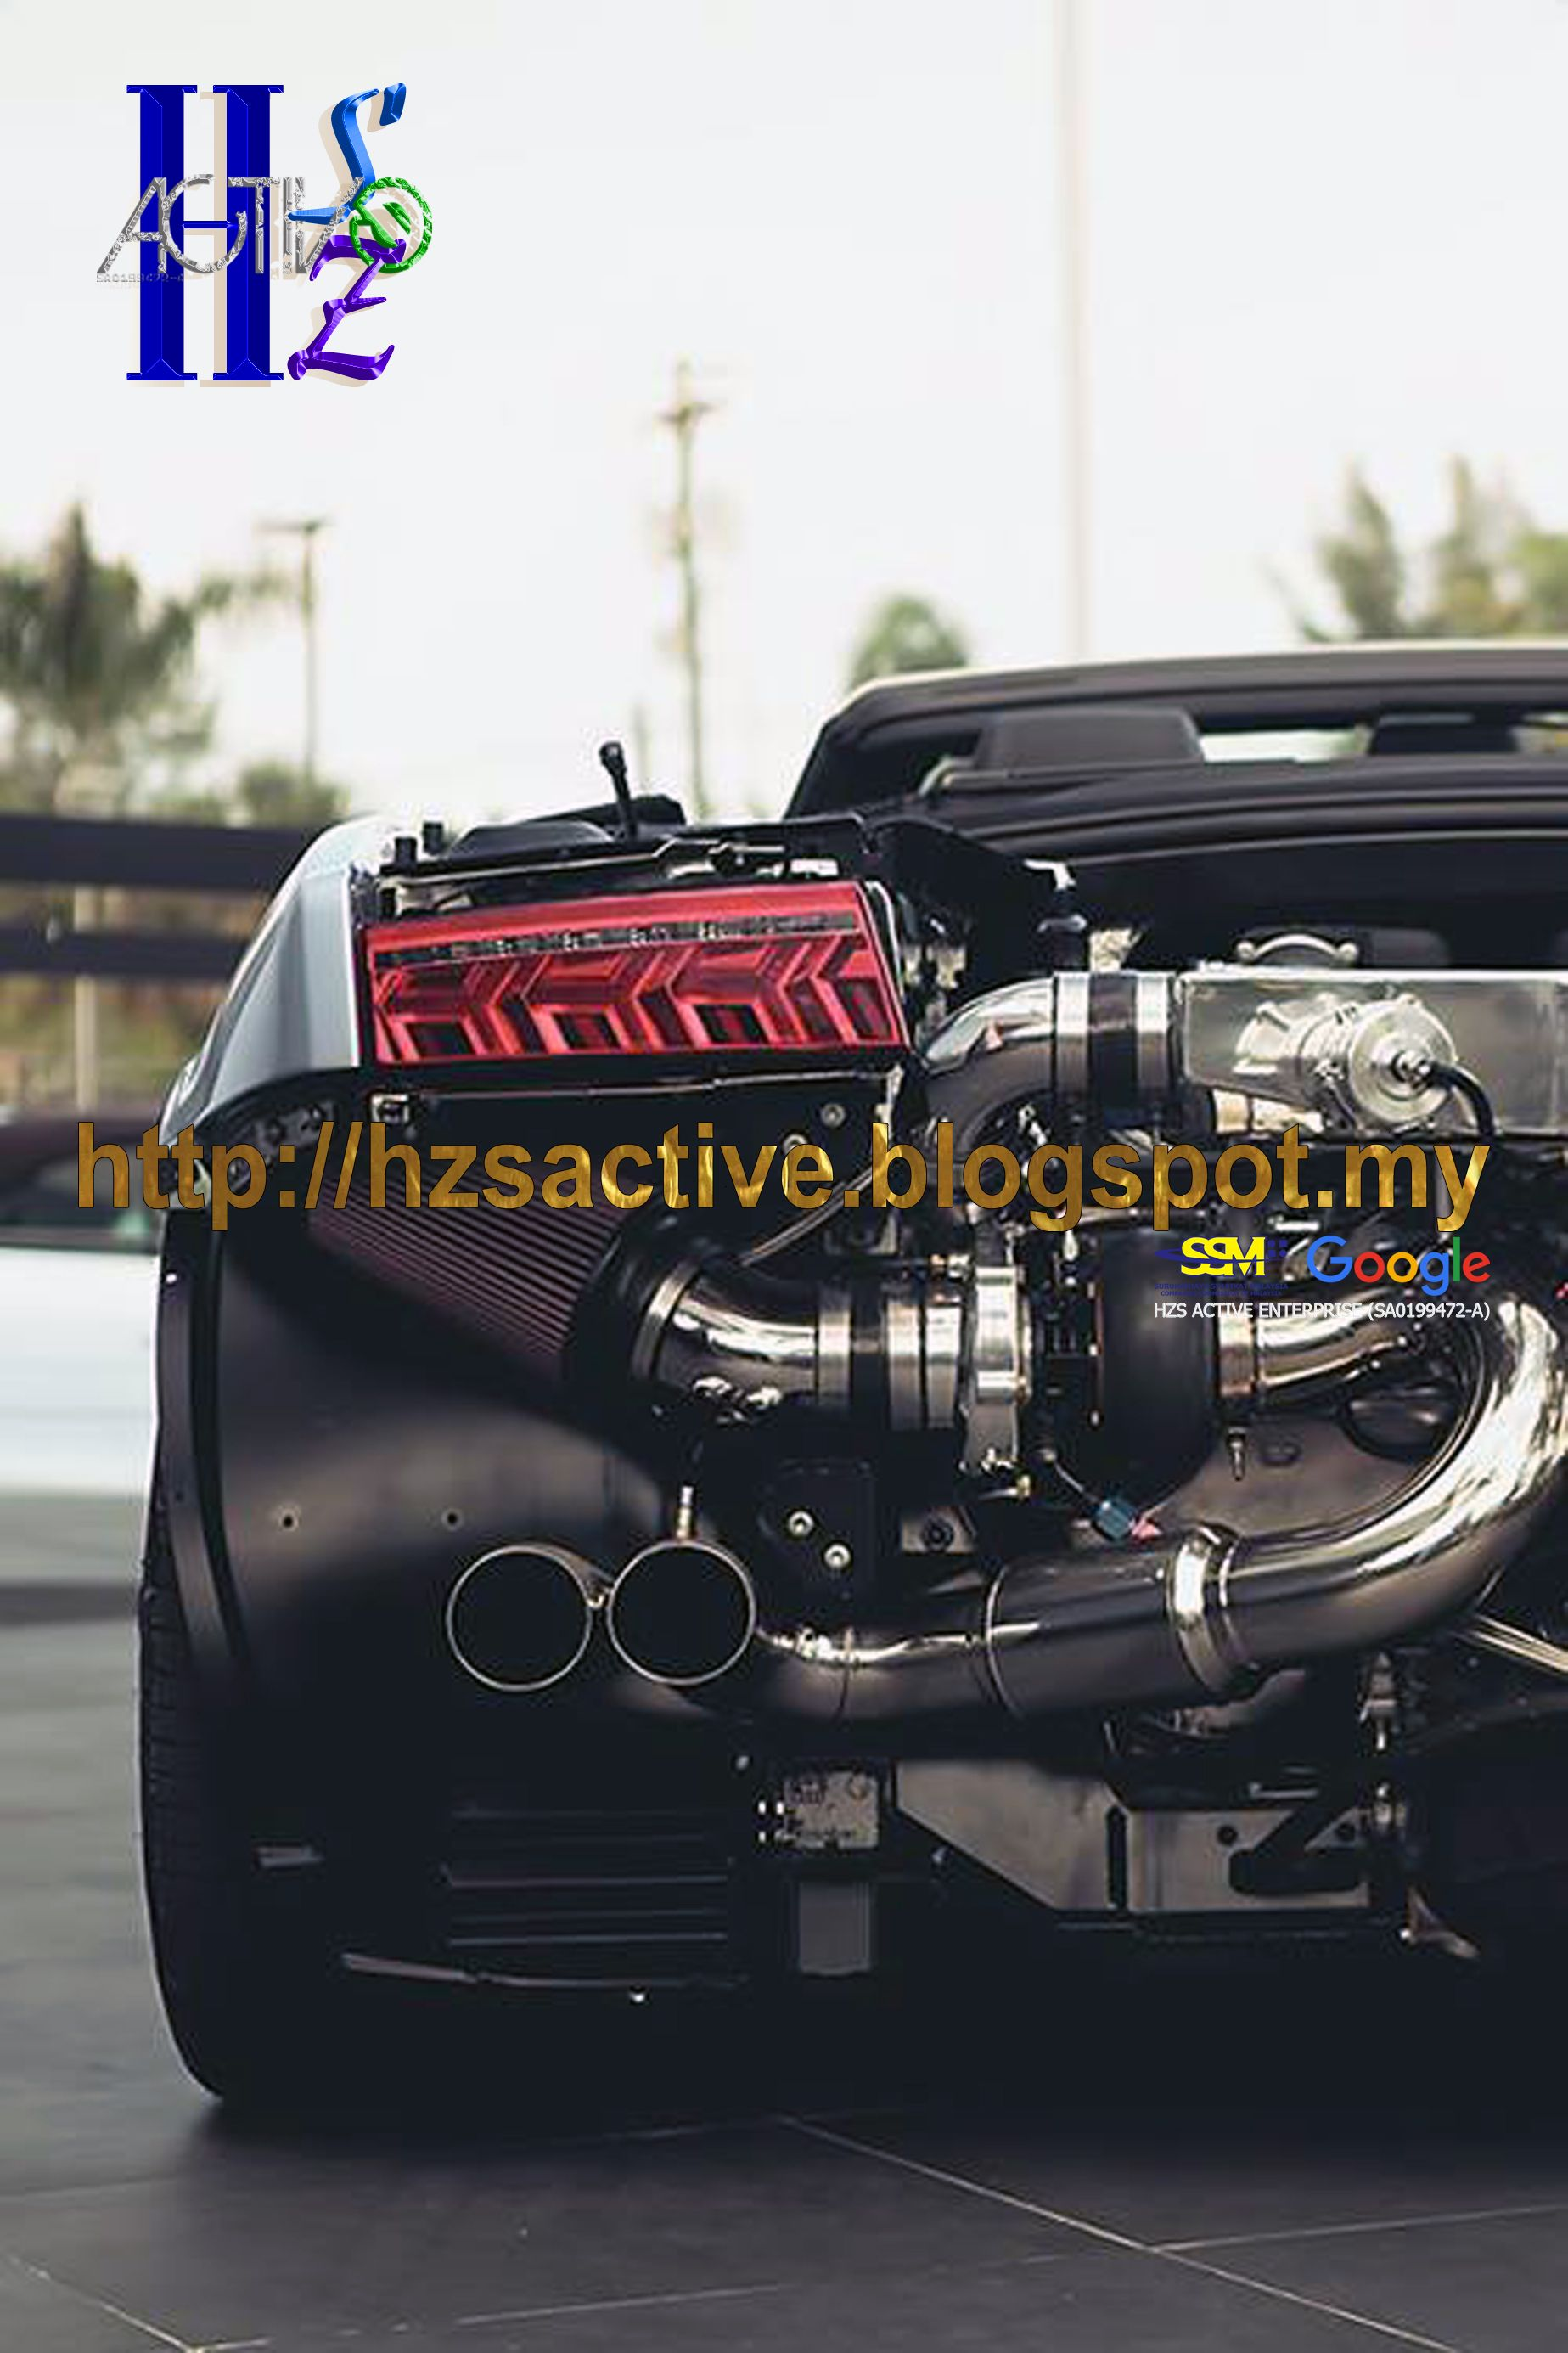 Hzs Active Enterprise Sa0199472 A Lamborghini Gallardo Audi Cars Sports Cars Luxury